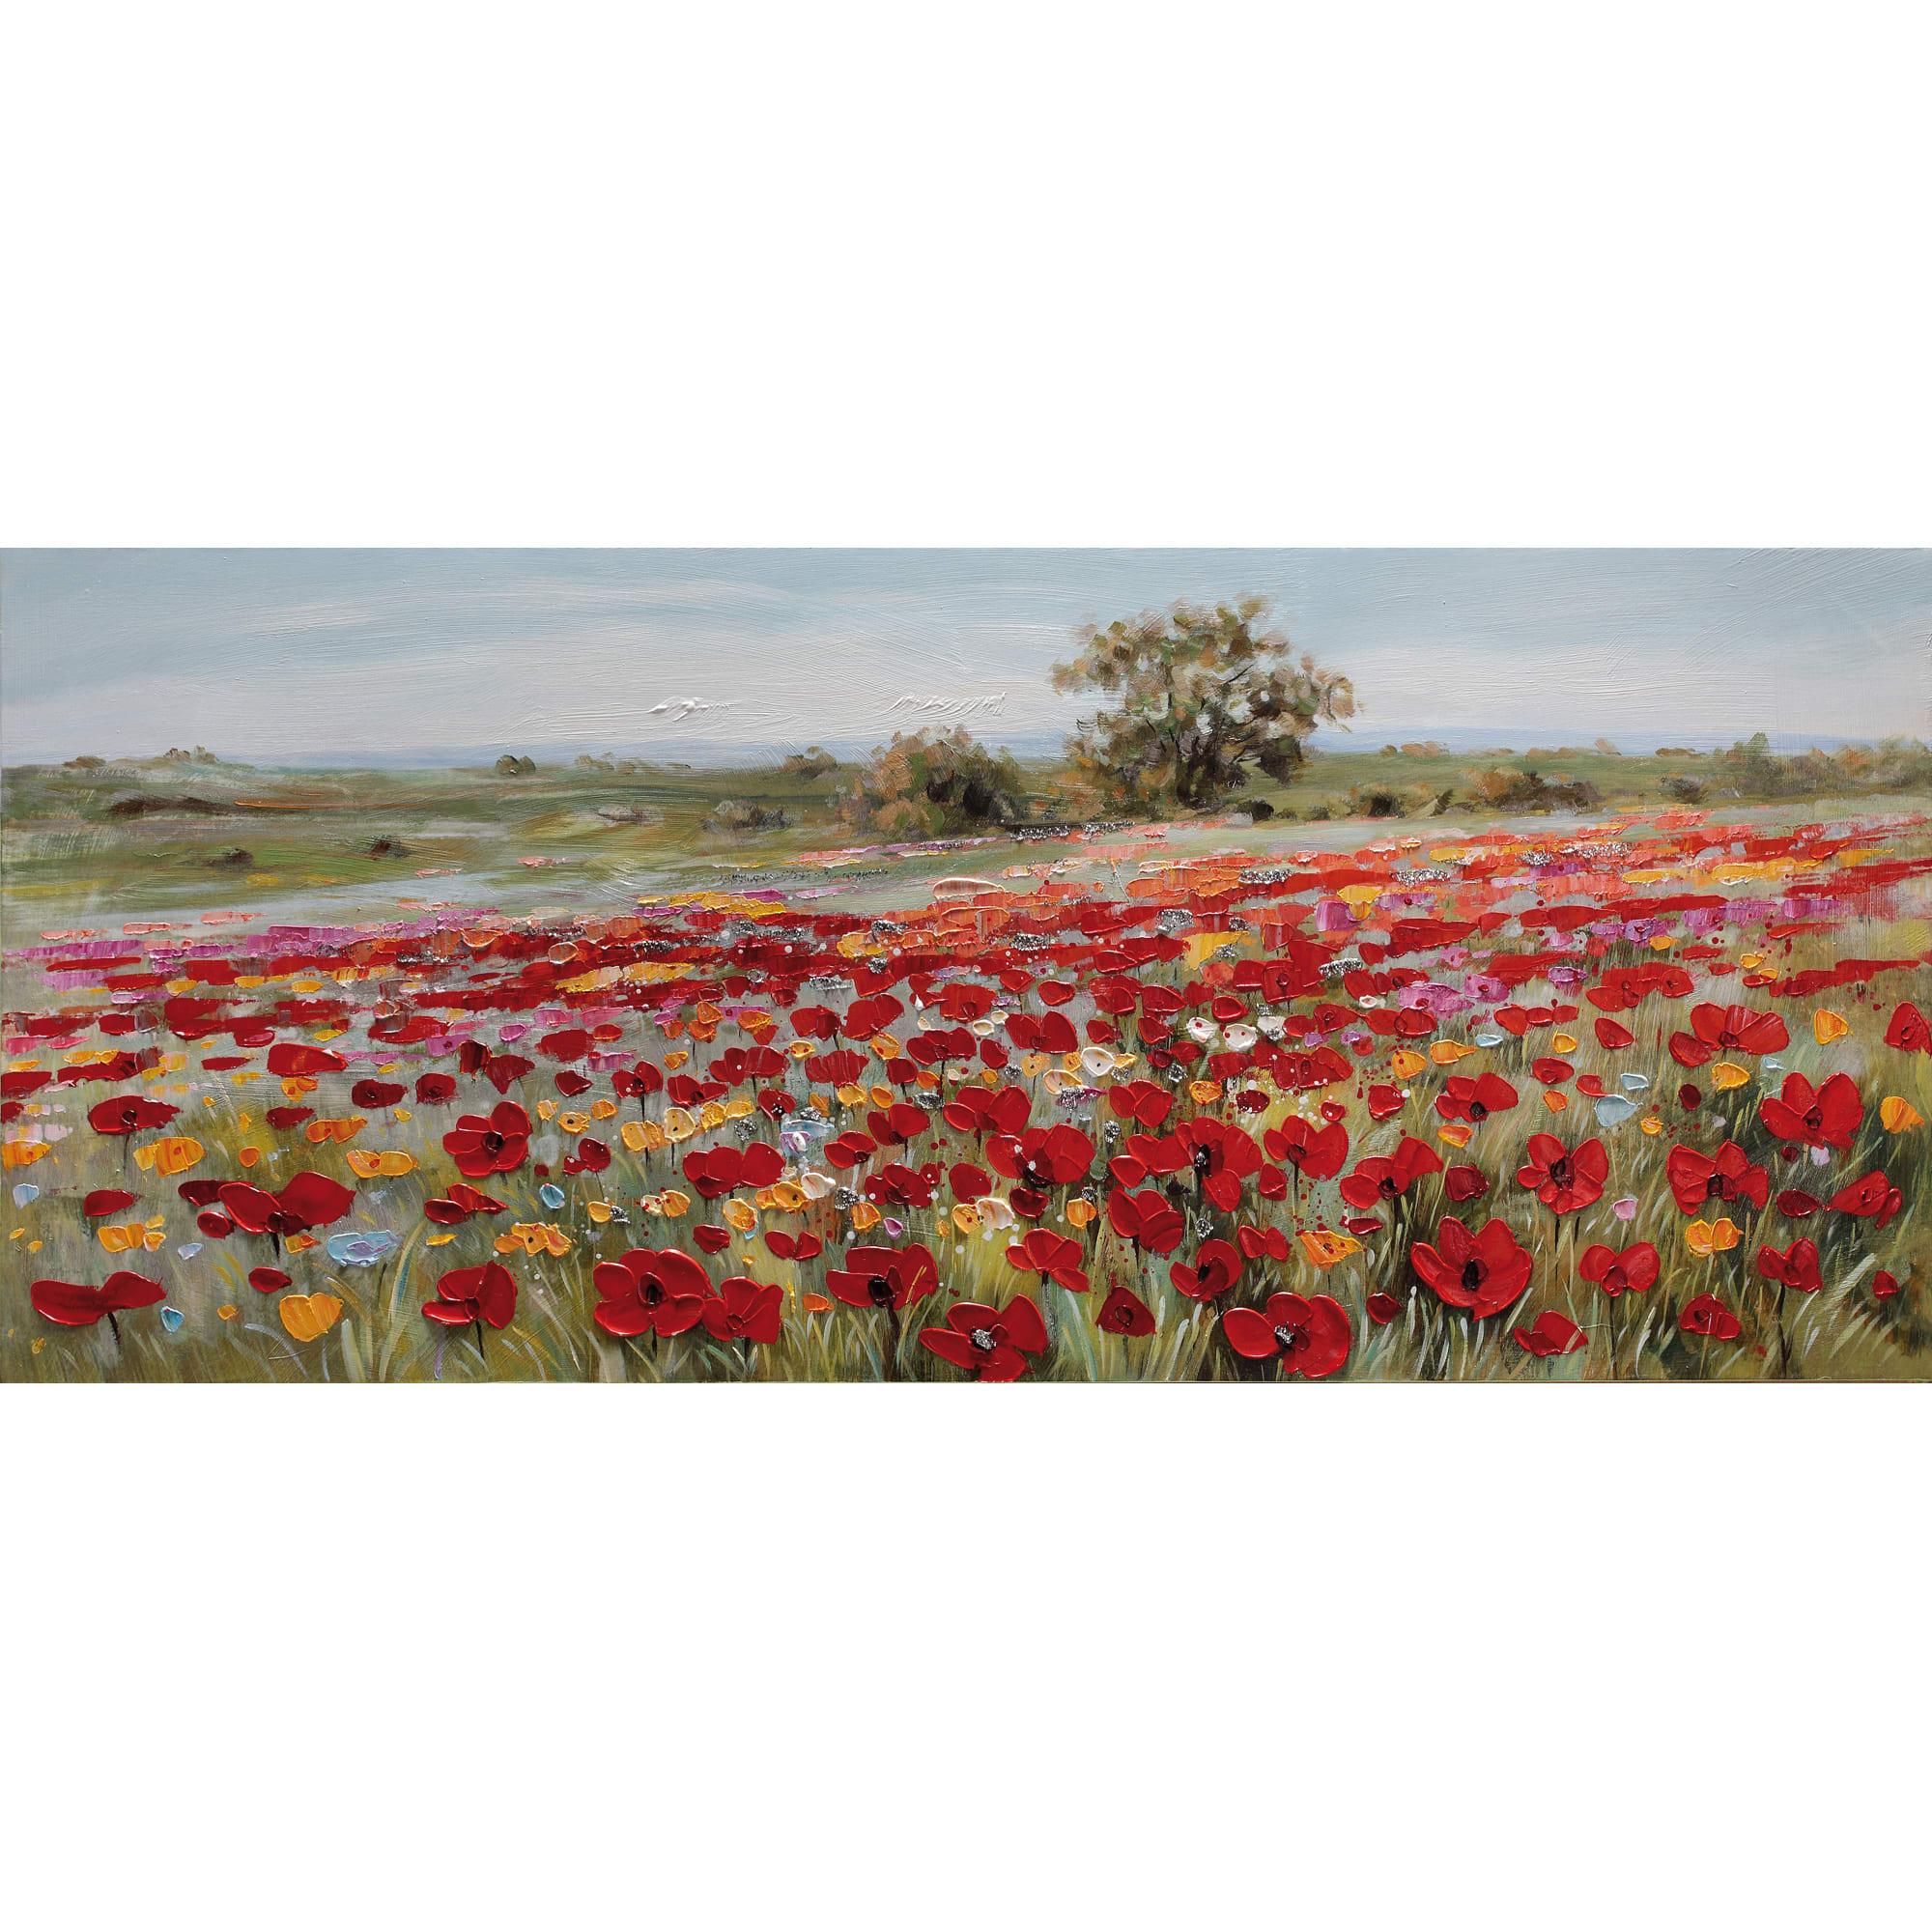 Quadri Cucina Leroy Merlin quadro dipinto a mano campo fiori 150x65 cm